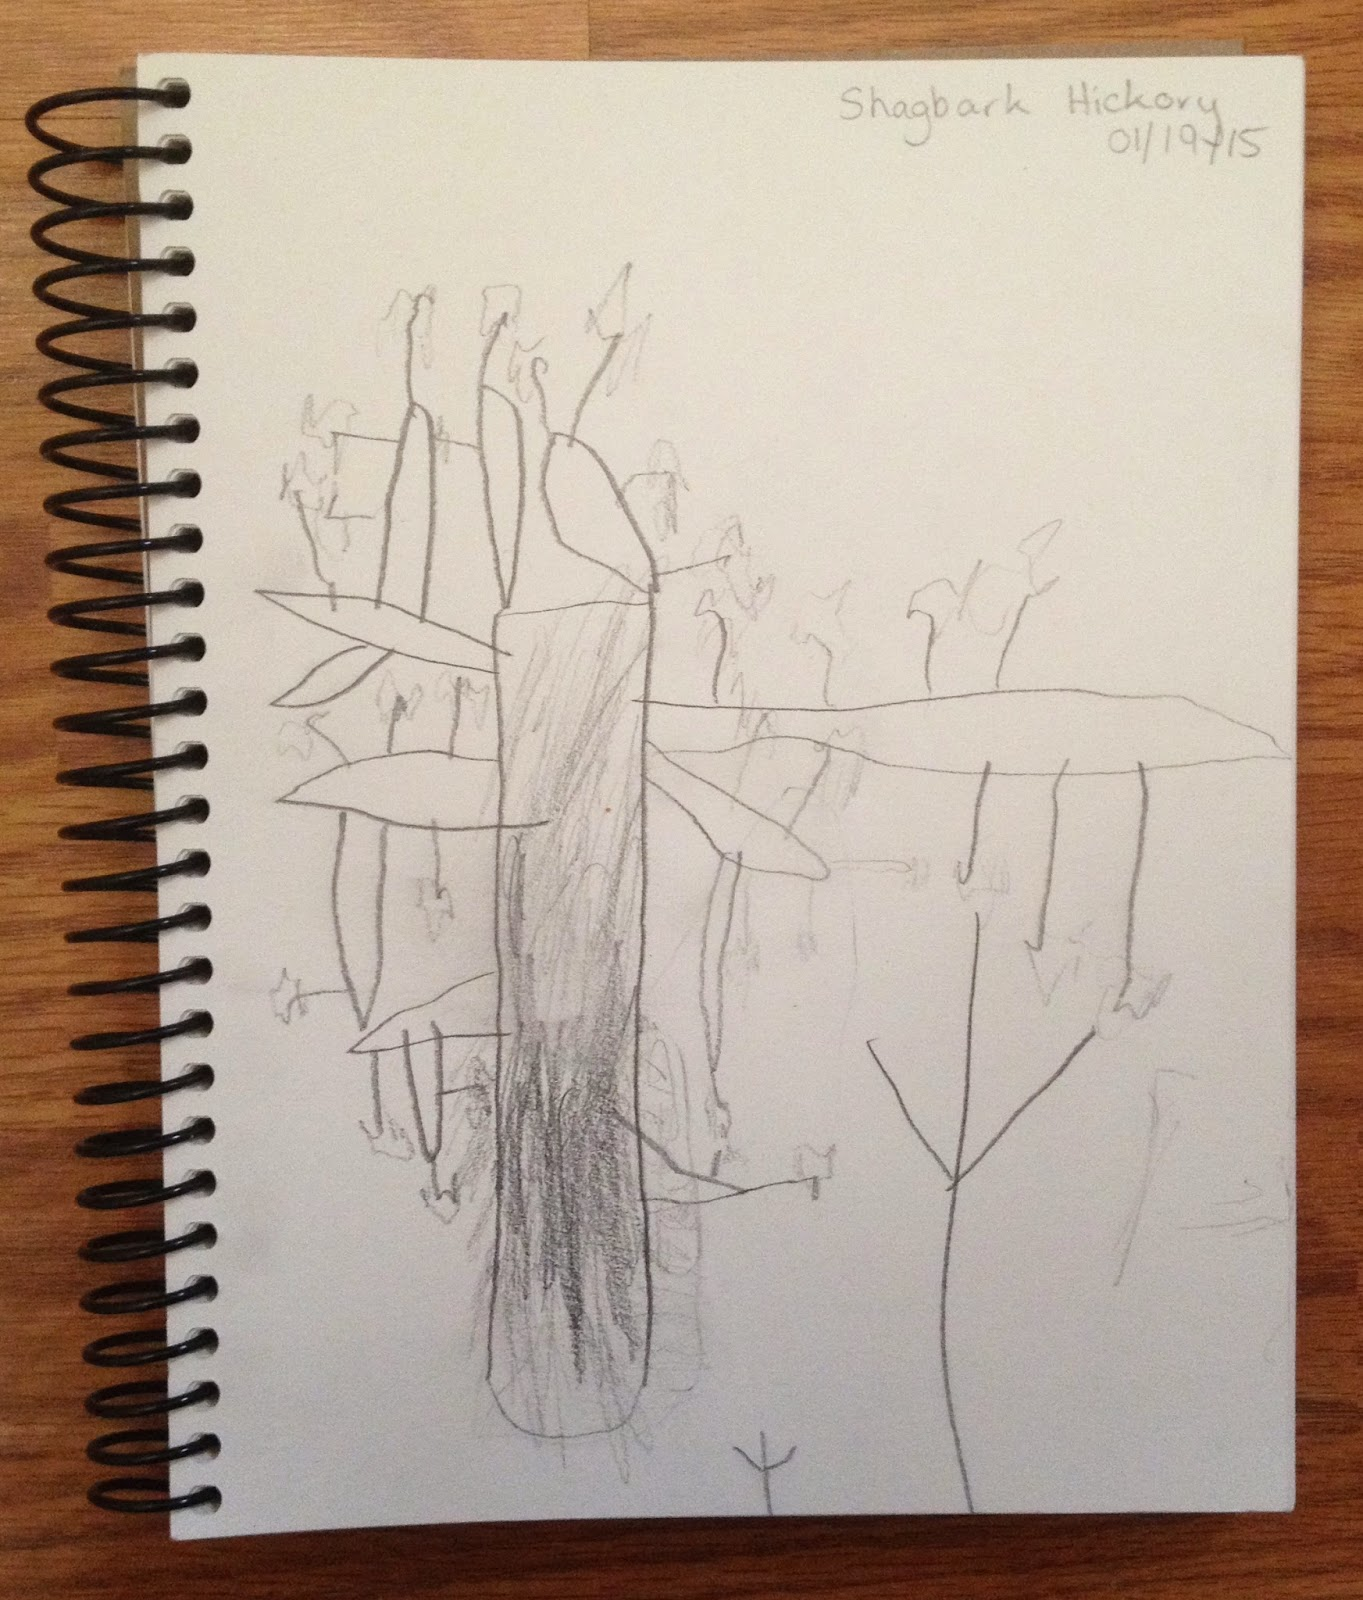 Nature Notebooks: Shagbark Hickory Sketches